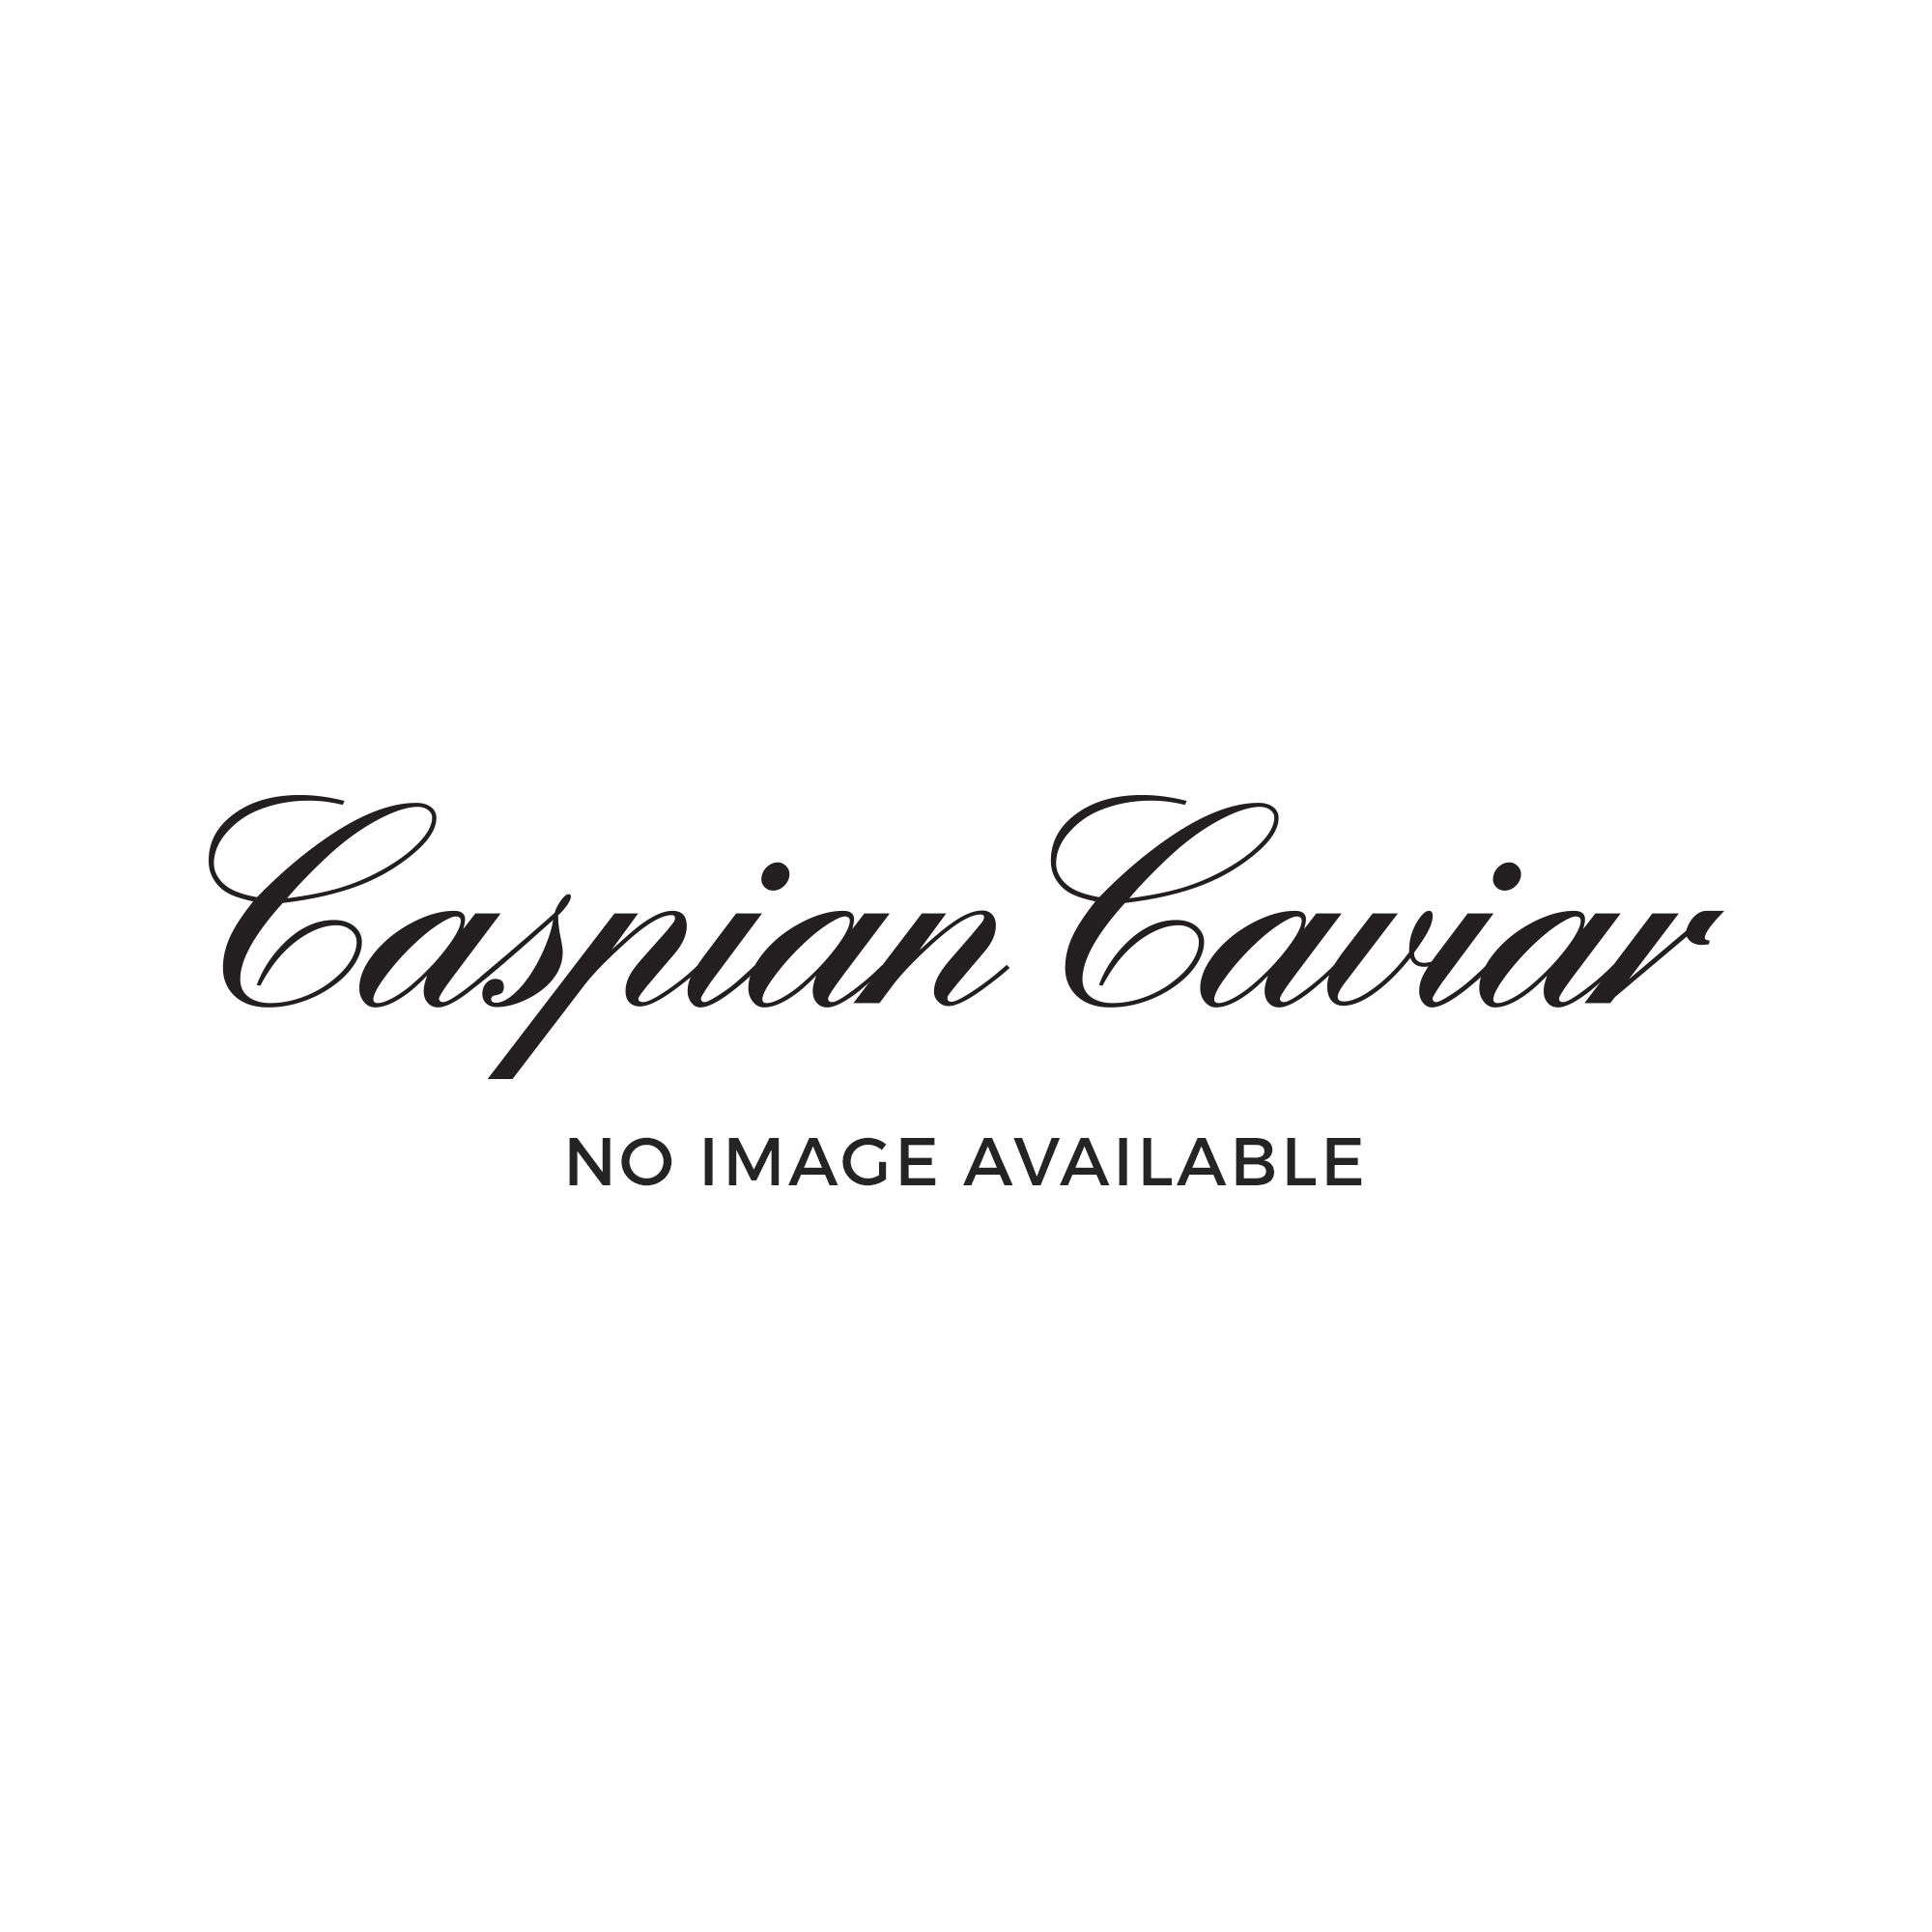 Caspian Caviar Vodka and Sibirskye Caviar Gift Box 30g or 50g